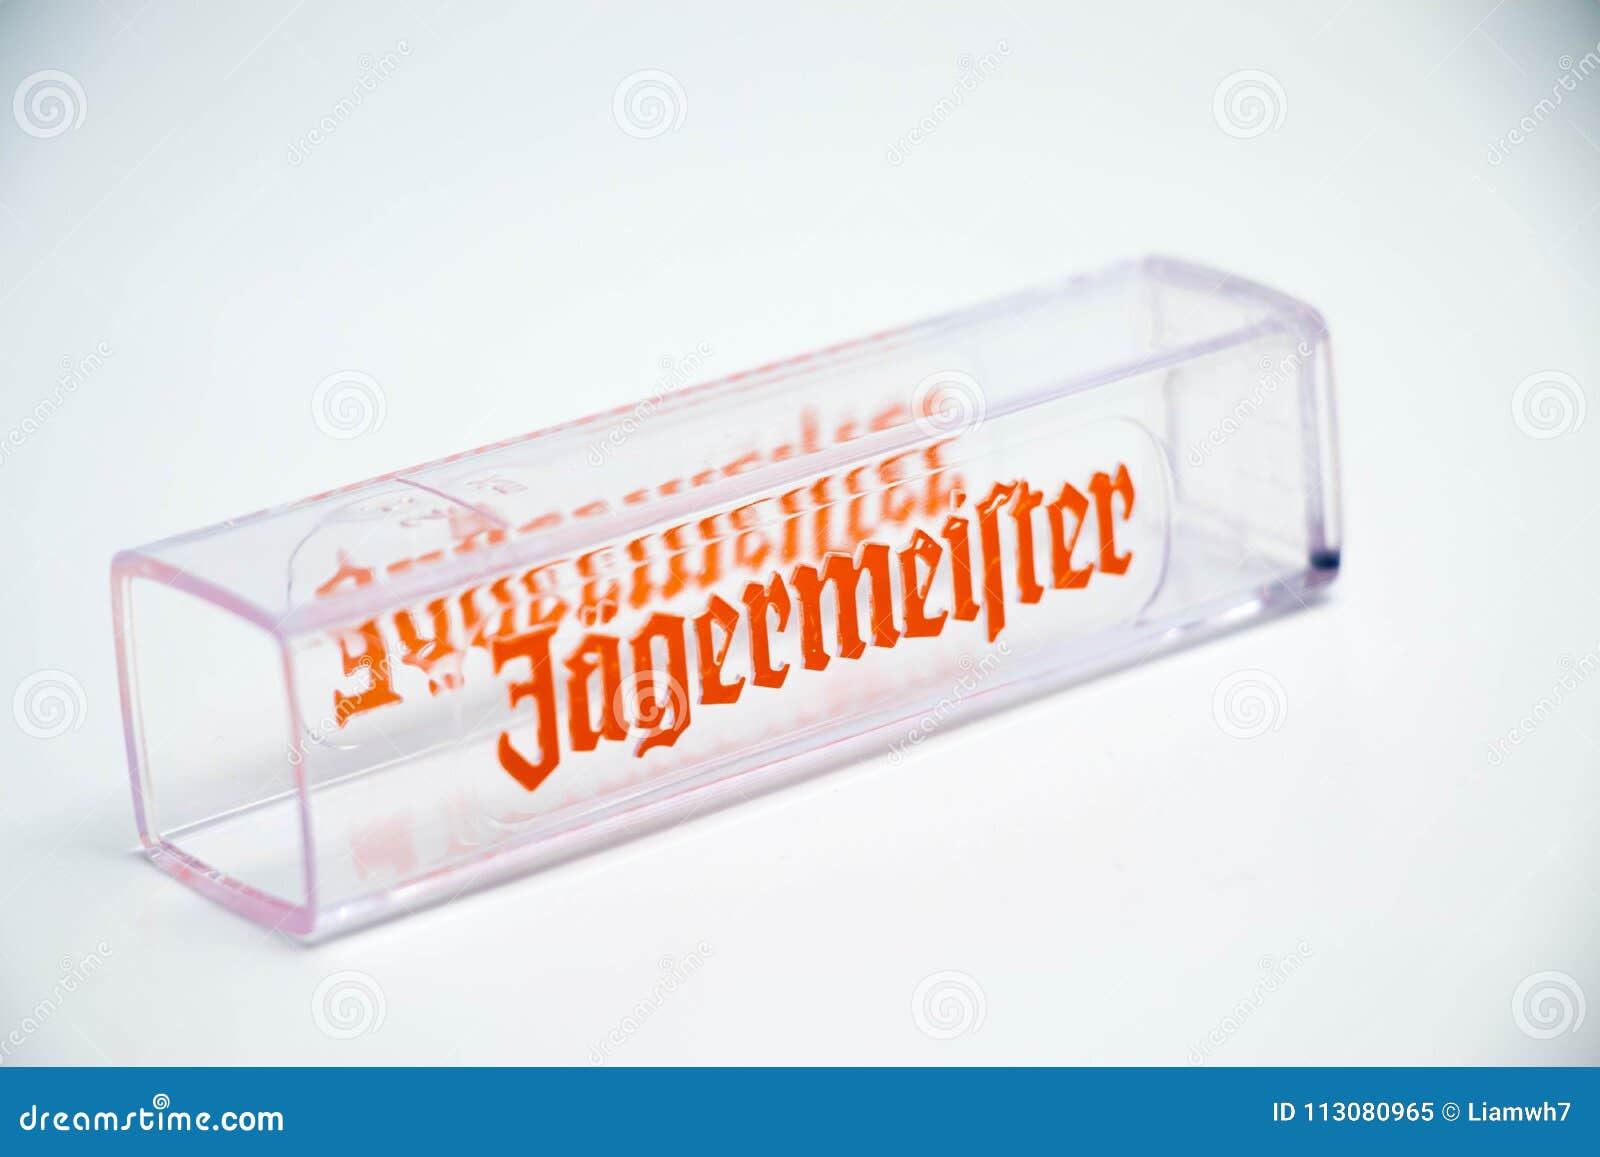 Geneva / Switzerland - March 20, 2018 : jagermeister Liquor shot glass brand logo deer